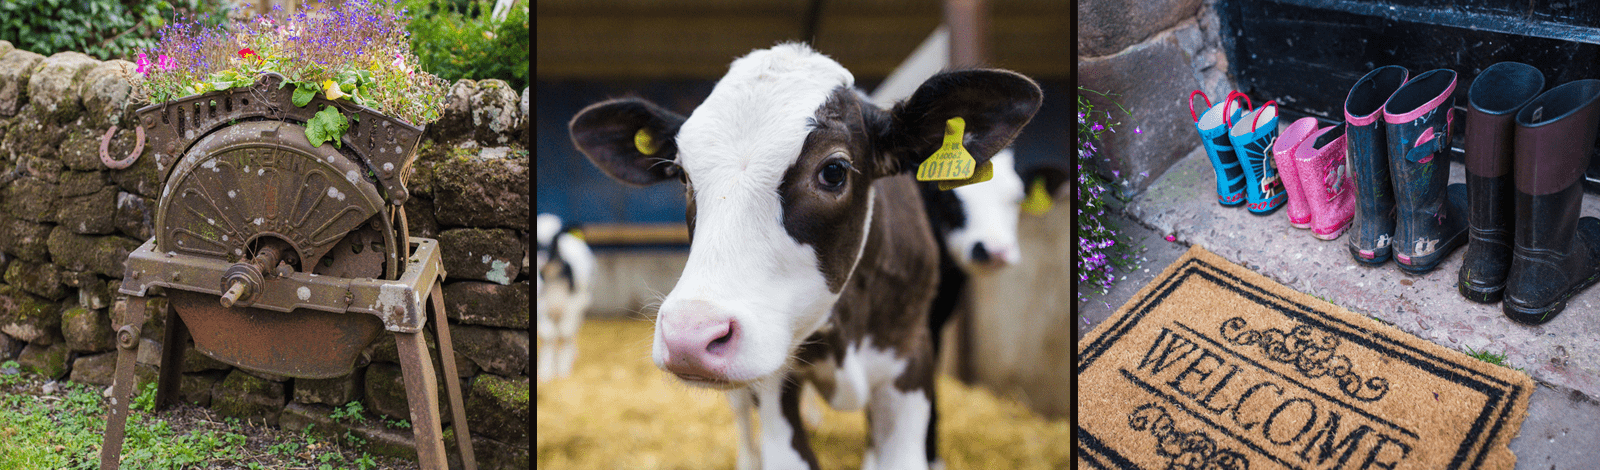 fairboroughs-cow